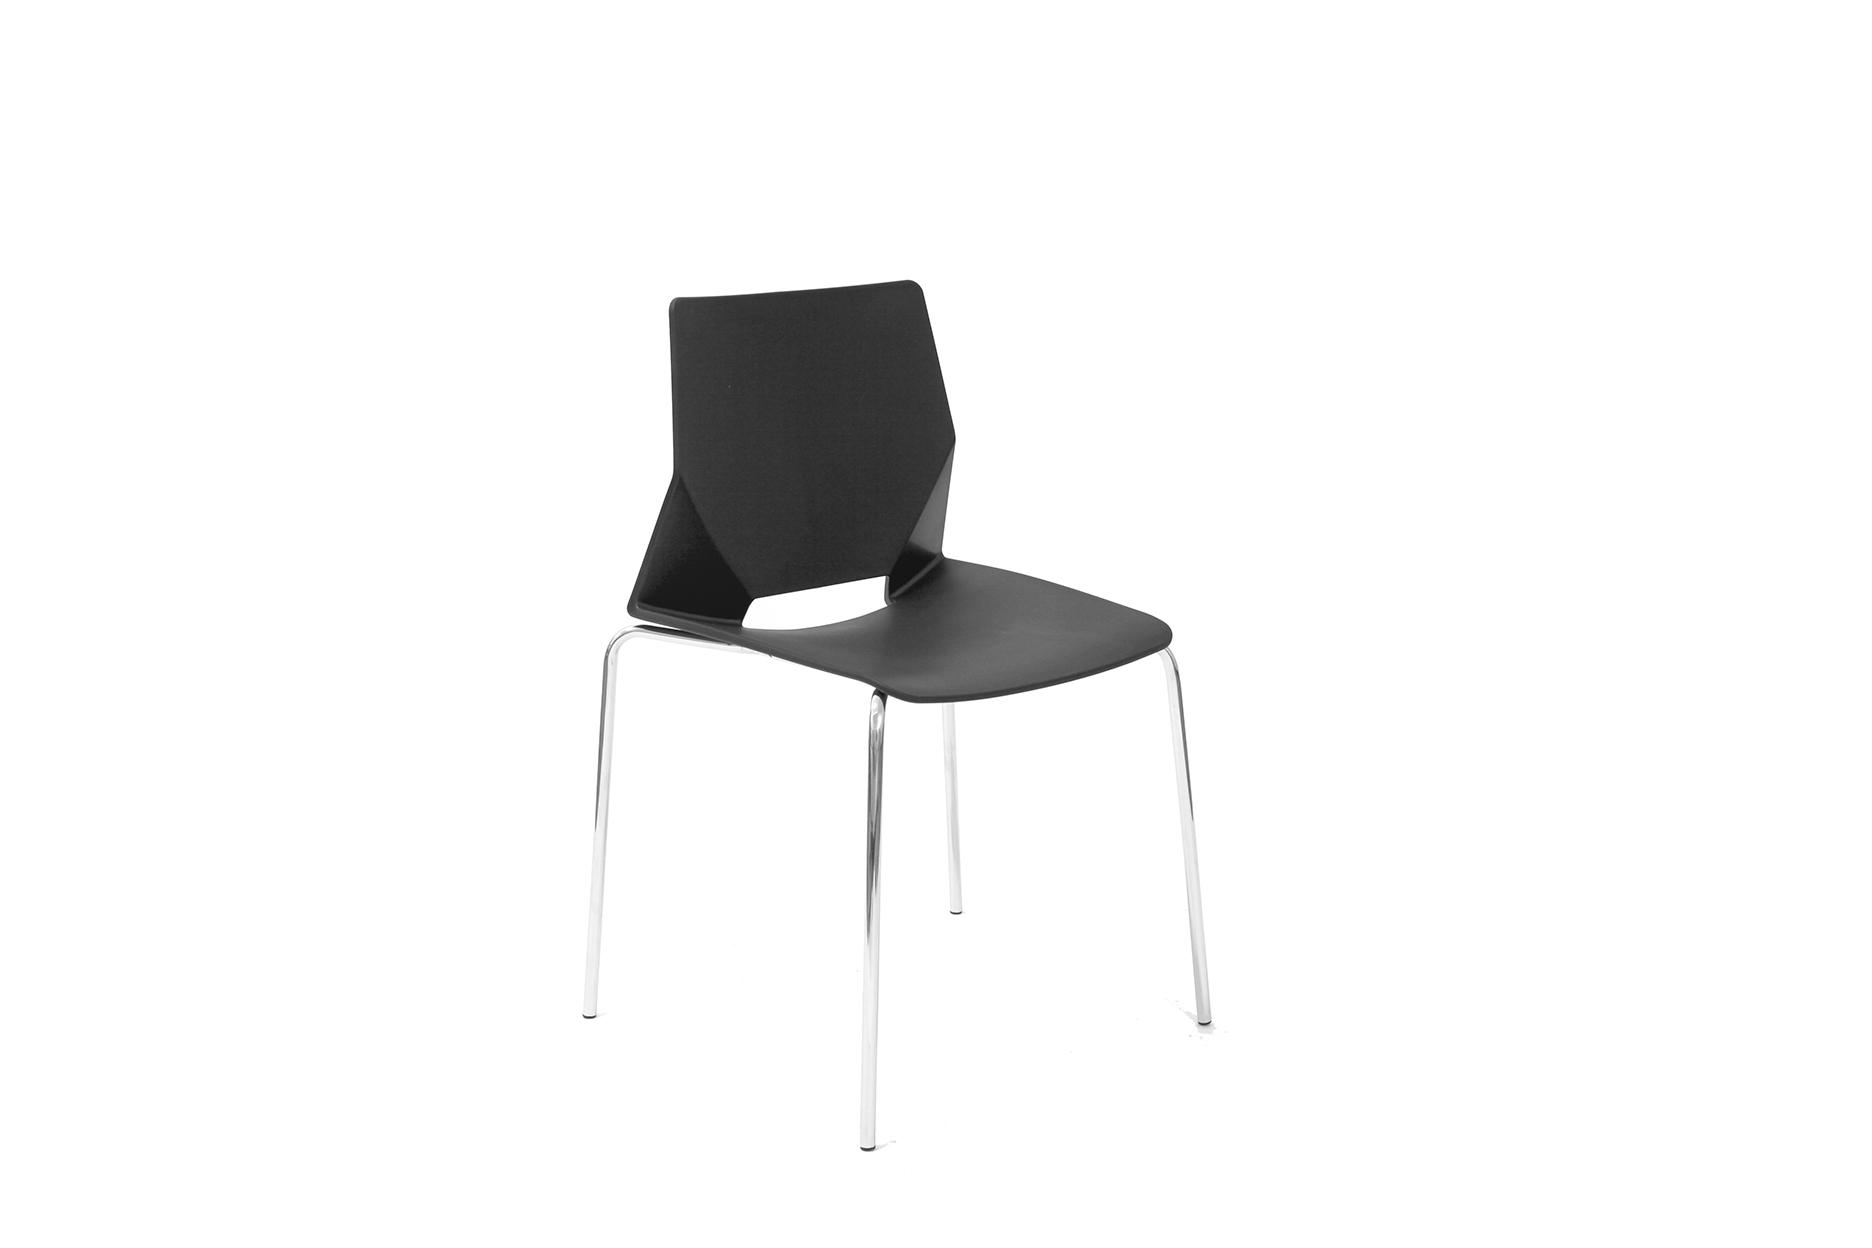 Стул HF-01 черныйОбеденные стулья<br><br><br>Material: Пластик<br>Width см: 58<br>Depth см: 52<br>Height см: 80